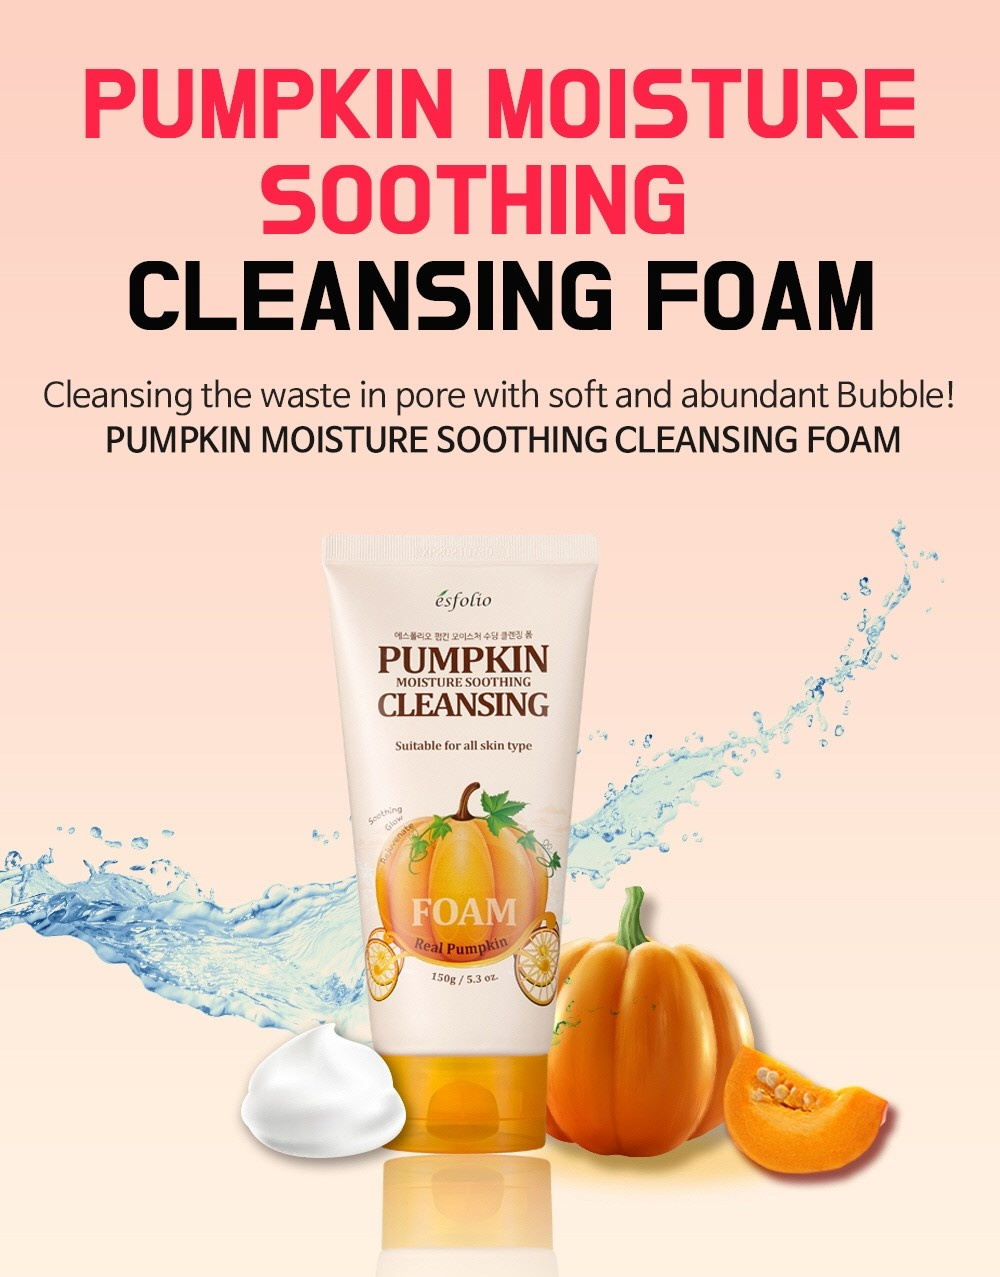 Pumpkin Moisture Soothing Cleansing Foam-2